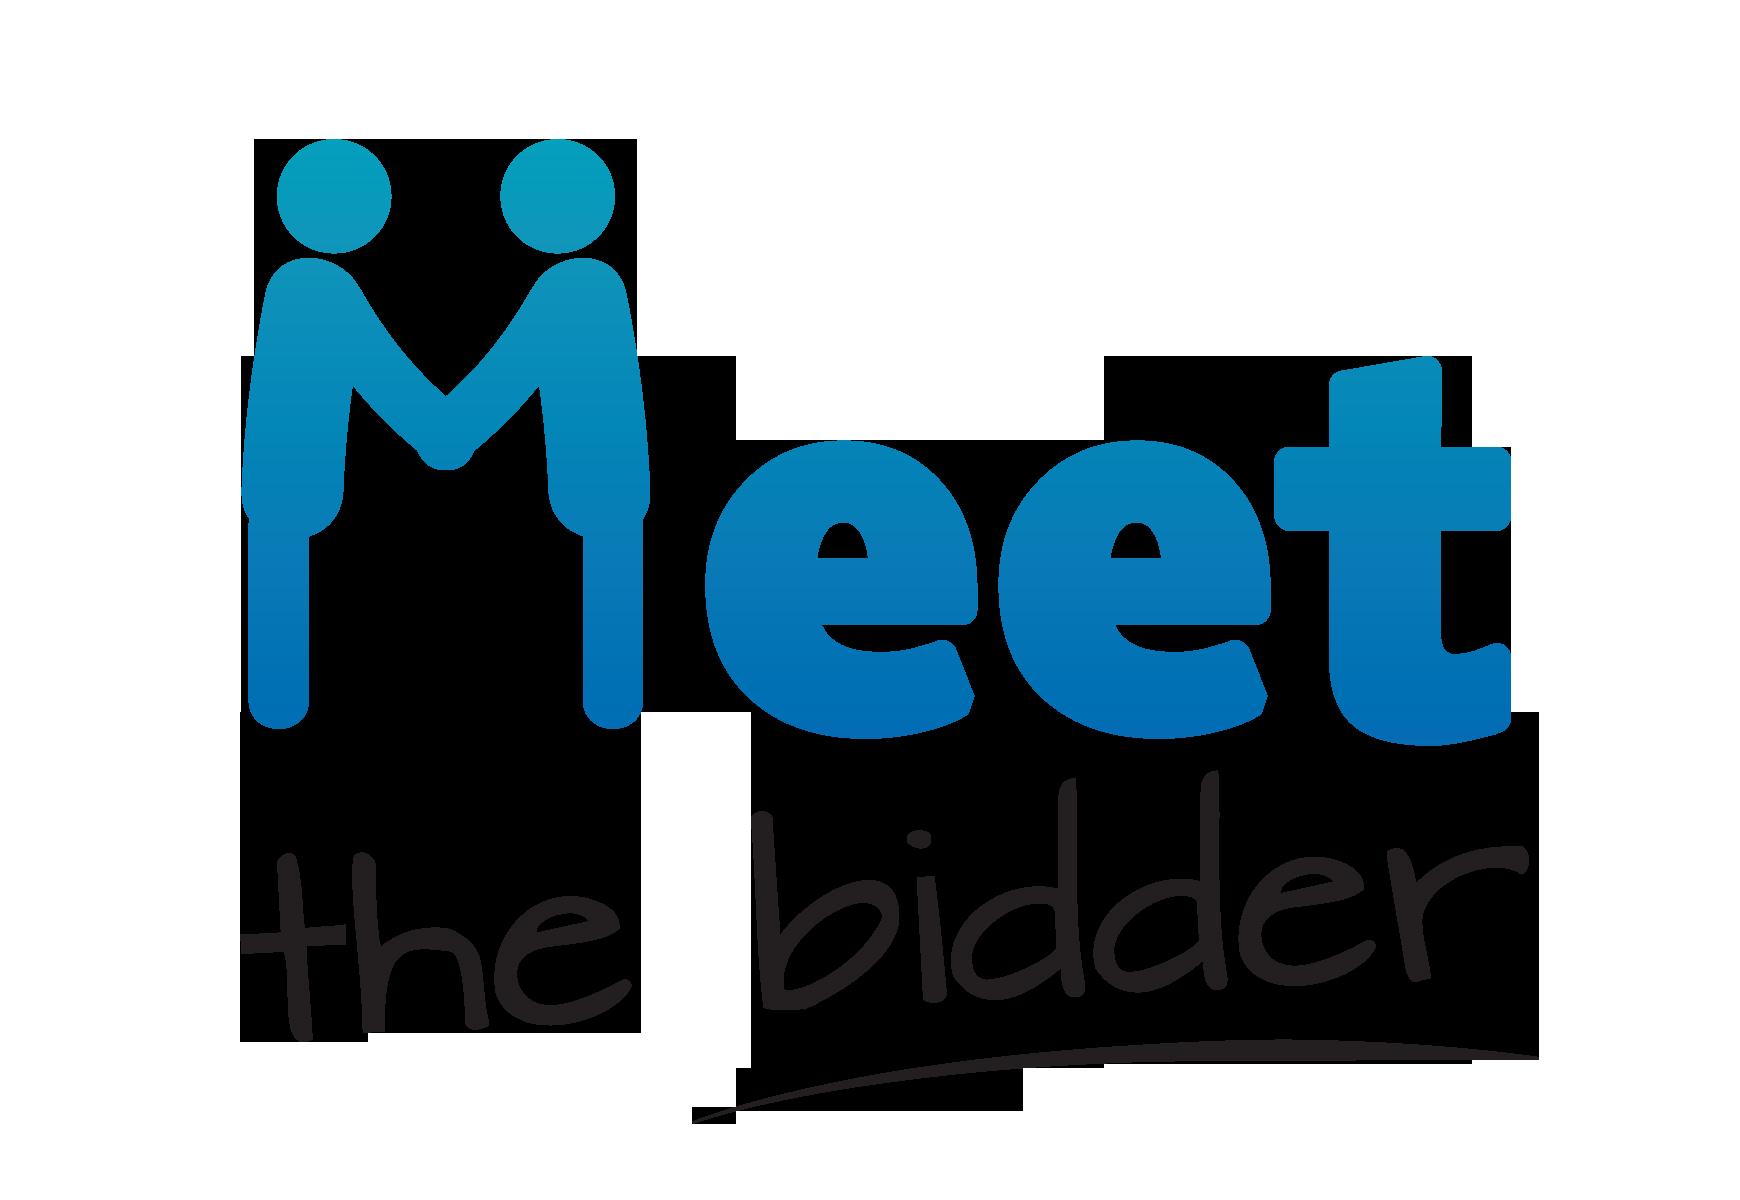 mtb logo proba 3